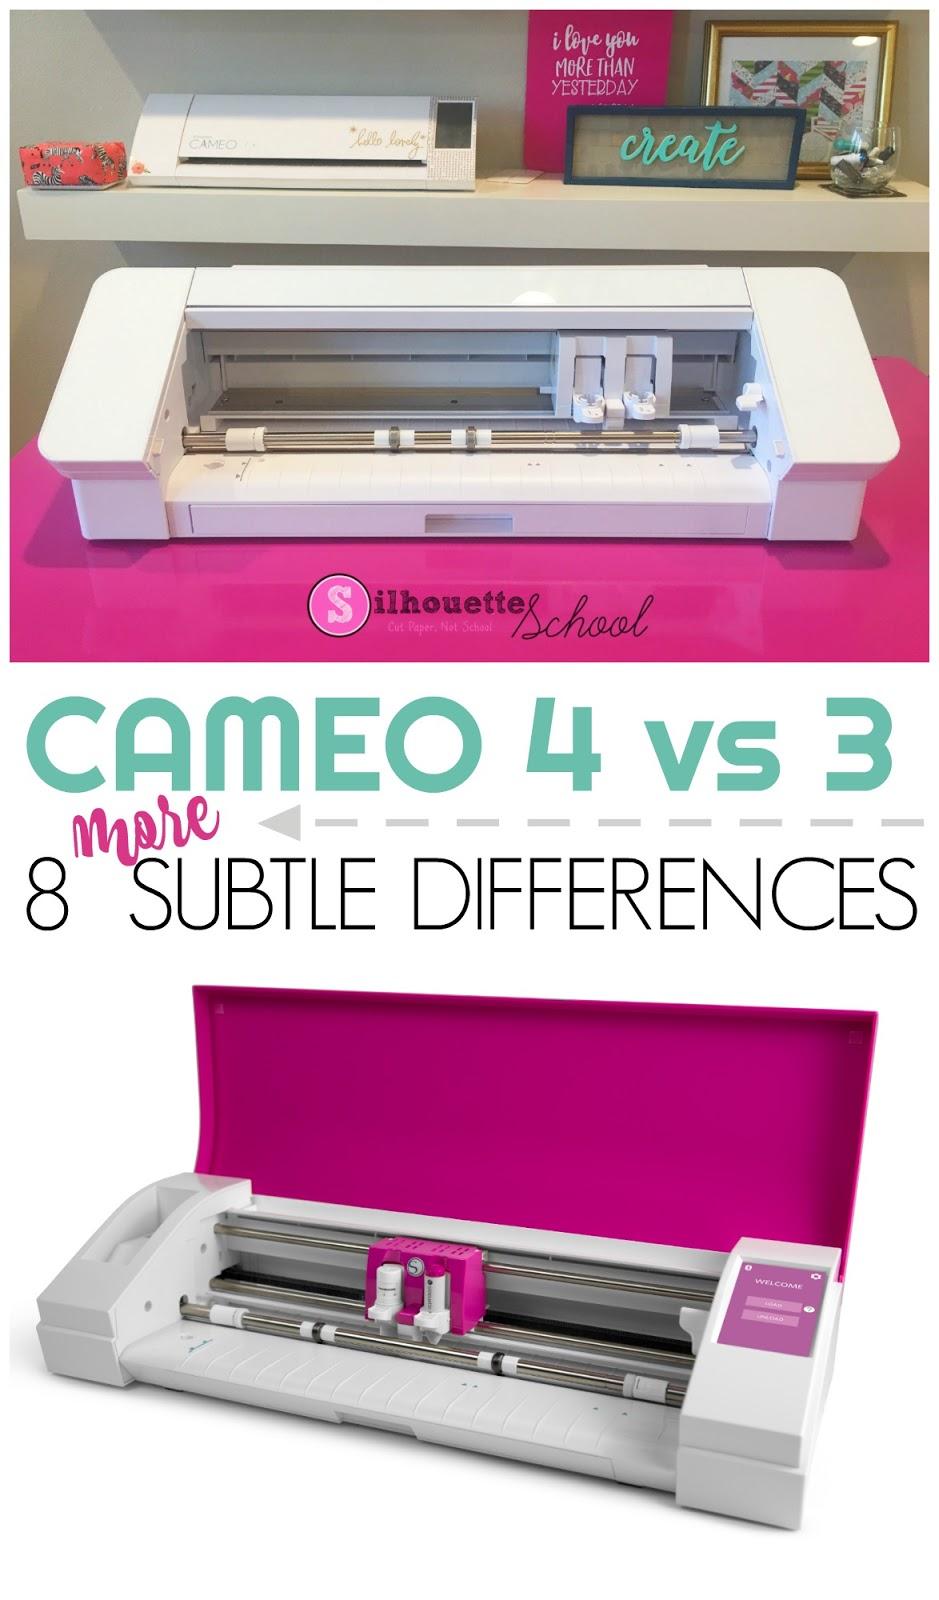 silhouette 101, silhouette america blog, silhouette cameo 4 tutorials, silhouette cameo 4 vs 3, cameo 4